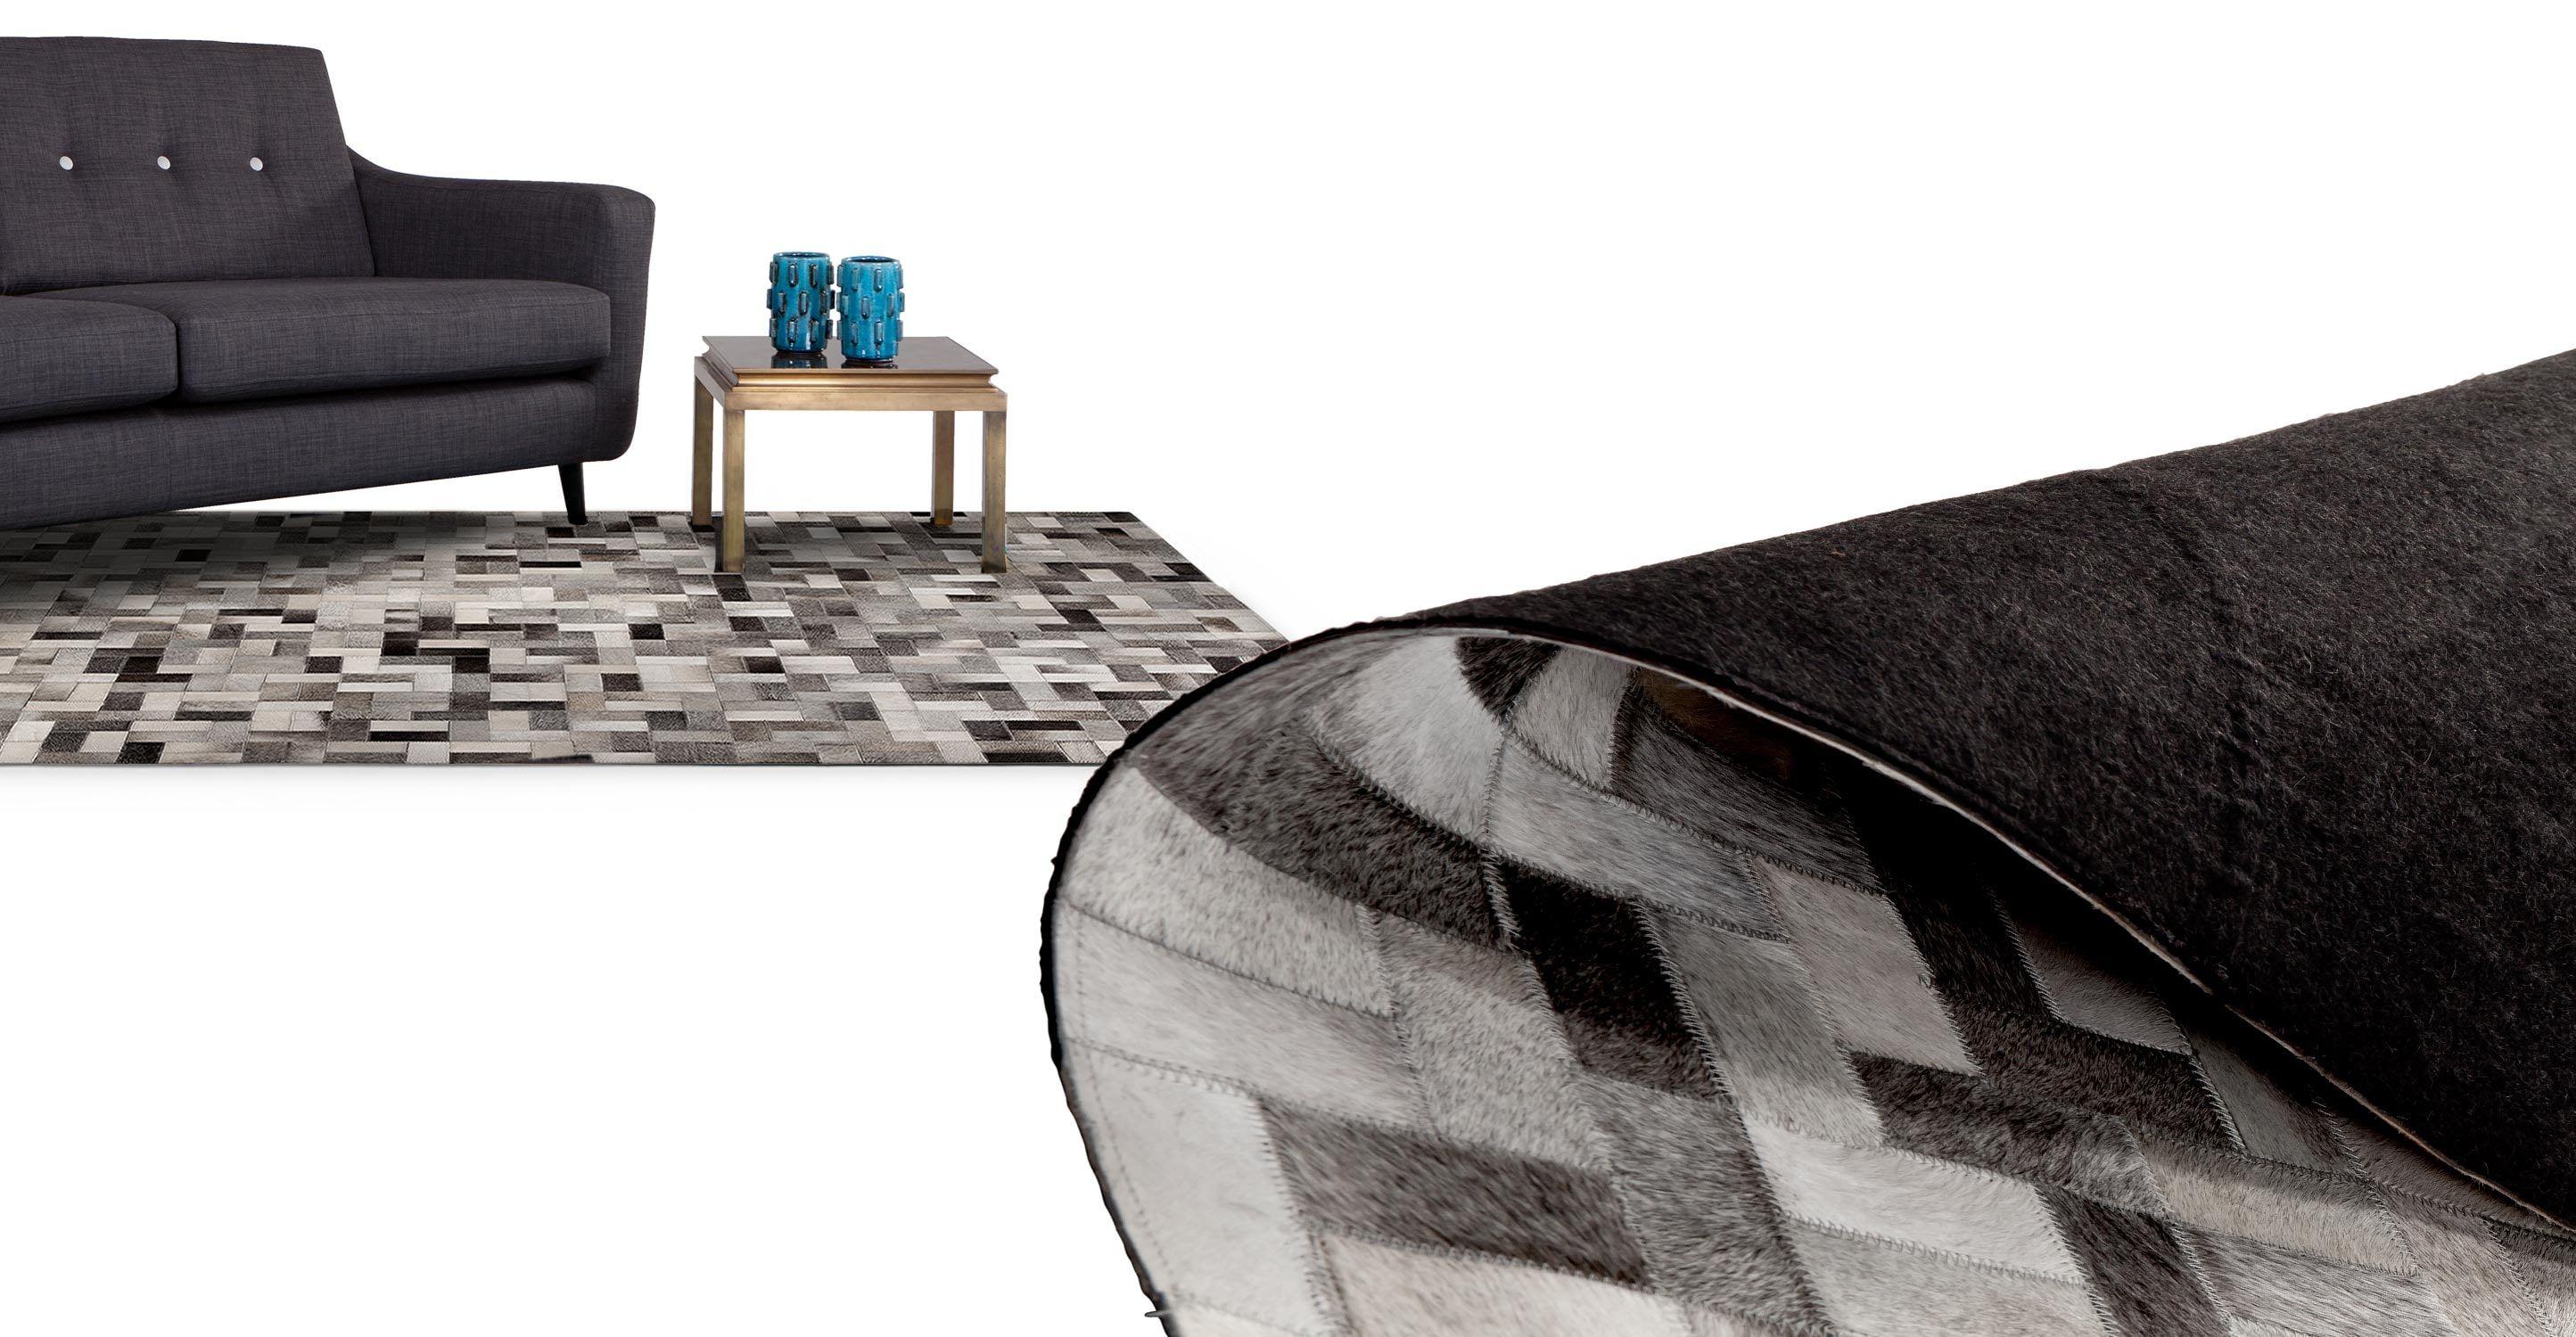 Großartig Kuh Teppich Ideen Von Parquet Kuhfell 170 X 240 Cm ▻